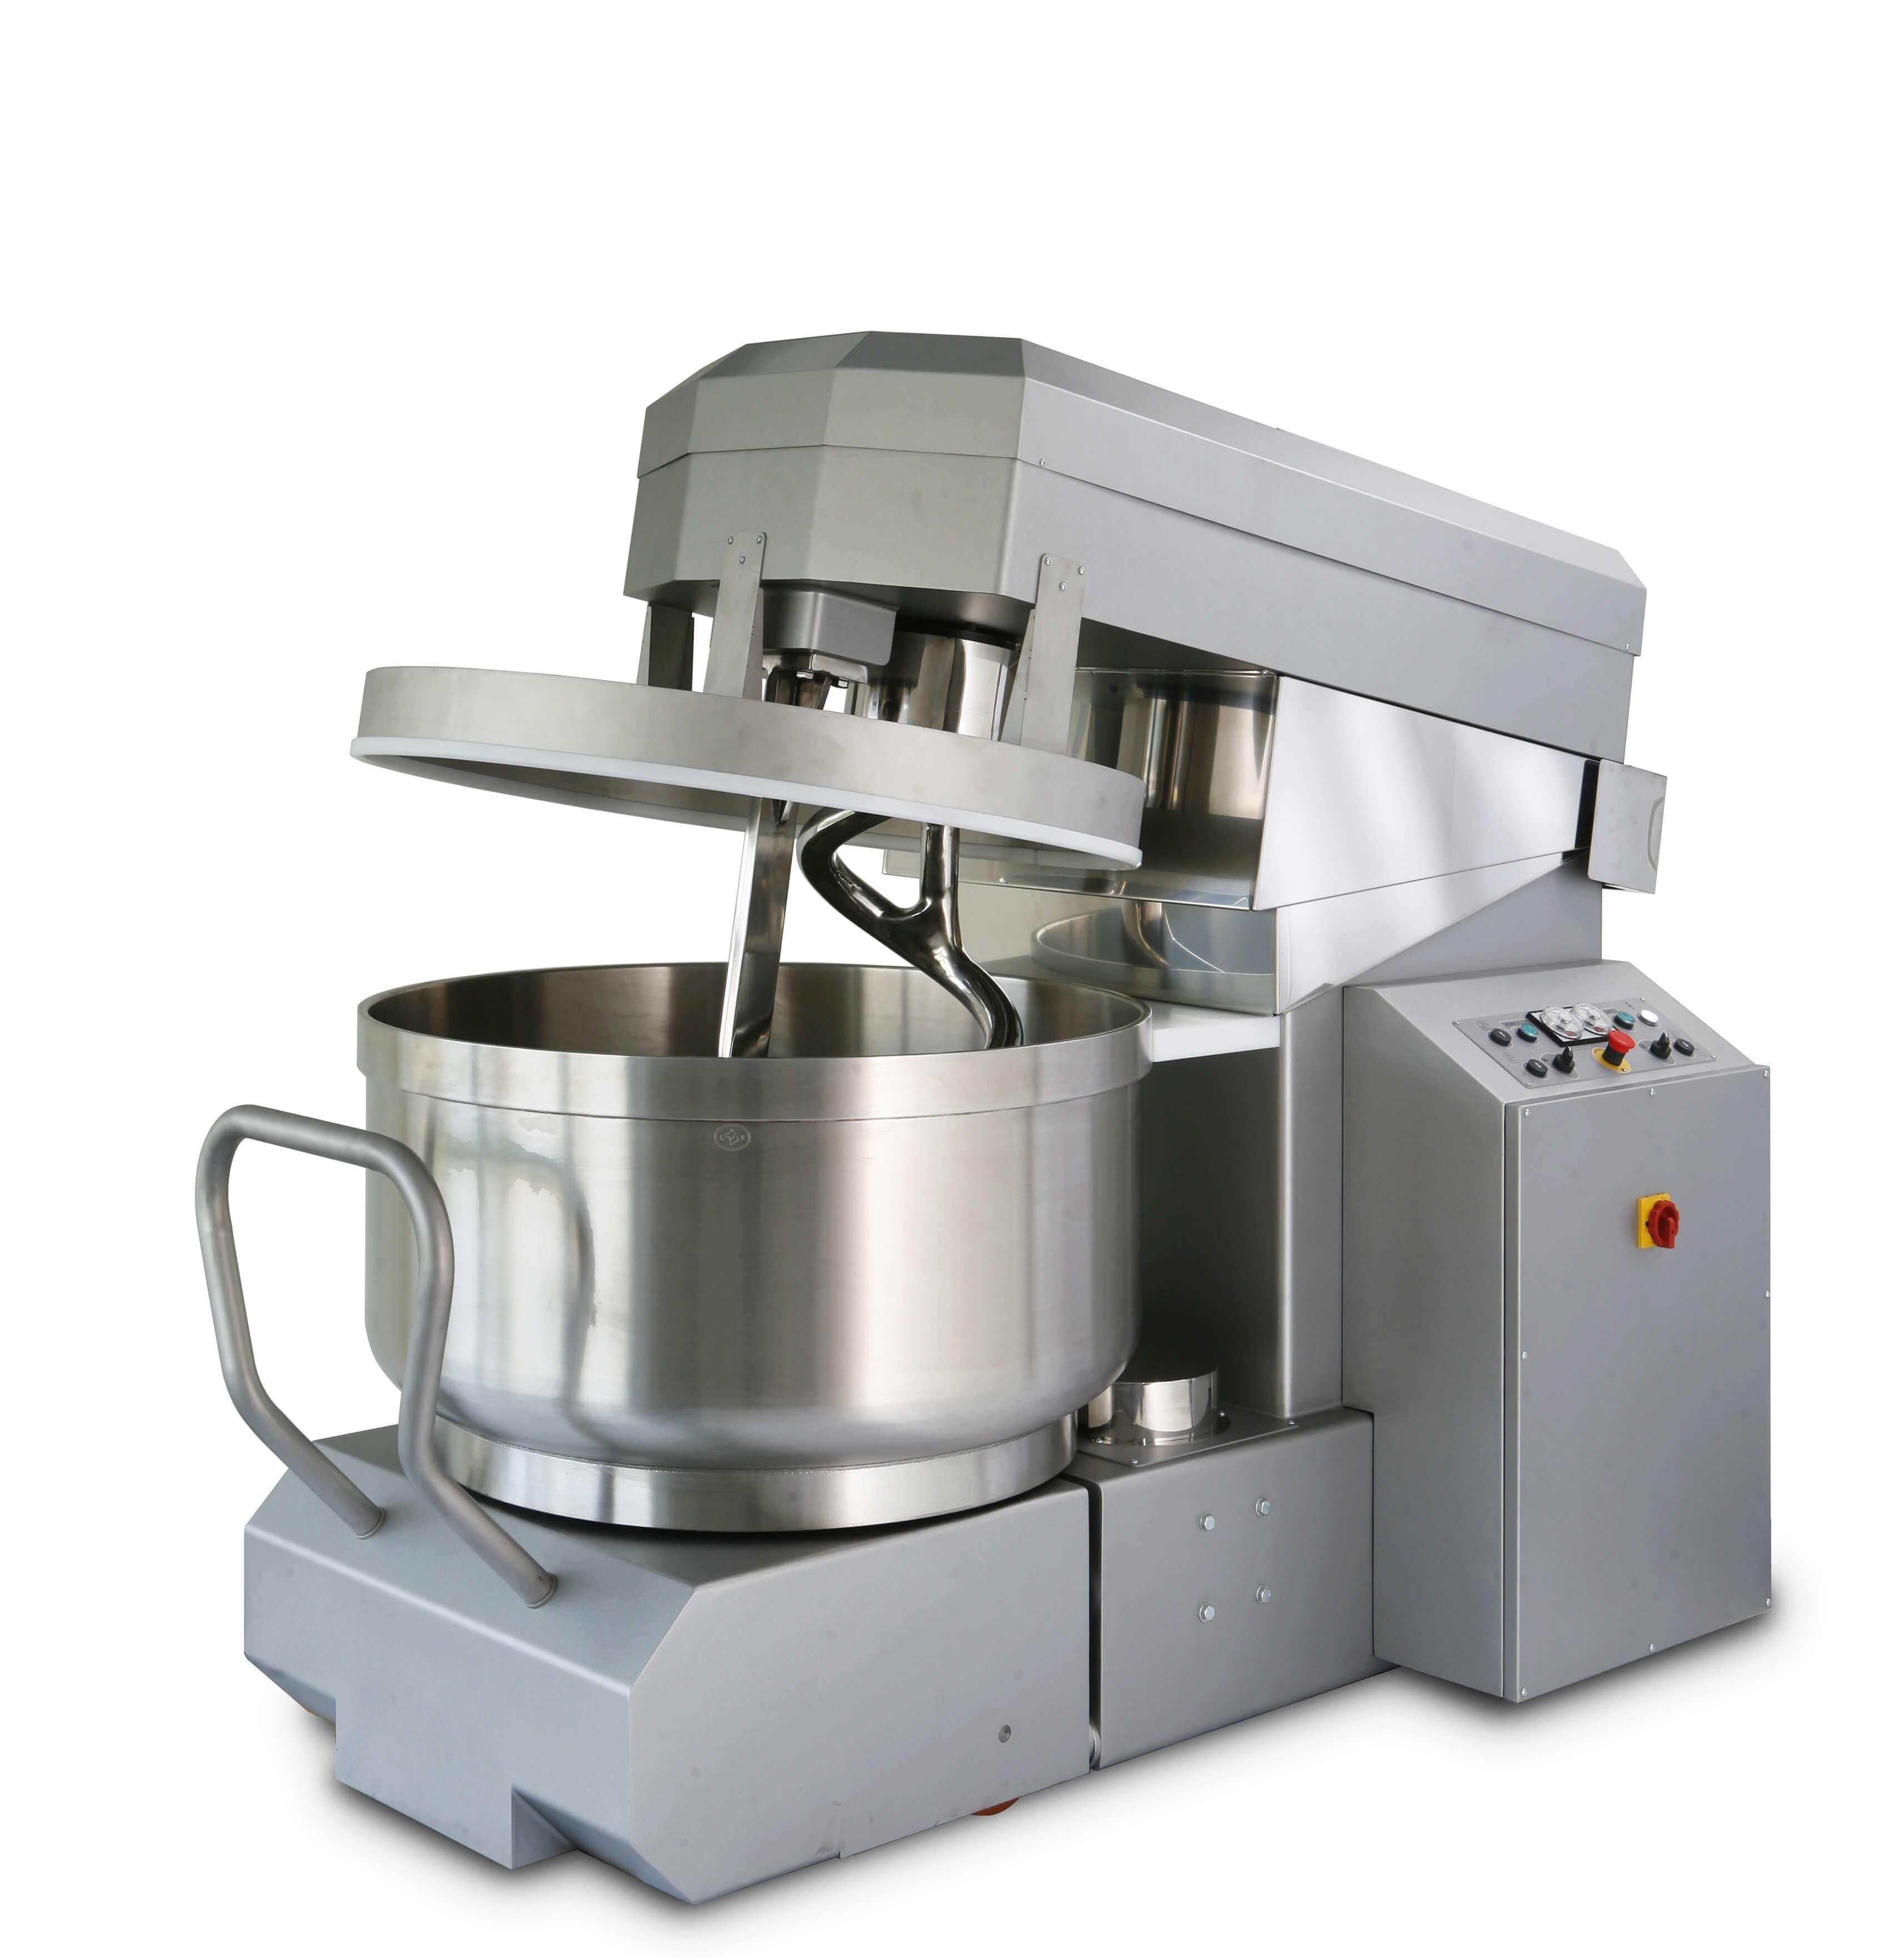 Mixing Dough Handling Gemini Bakery Equipment Company